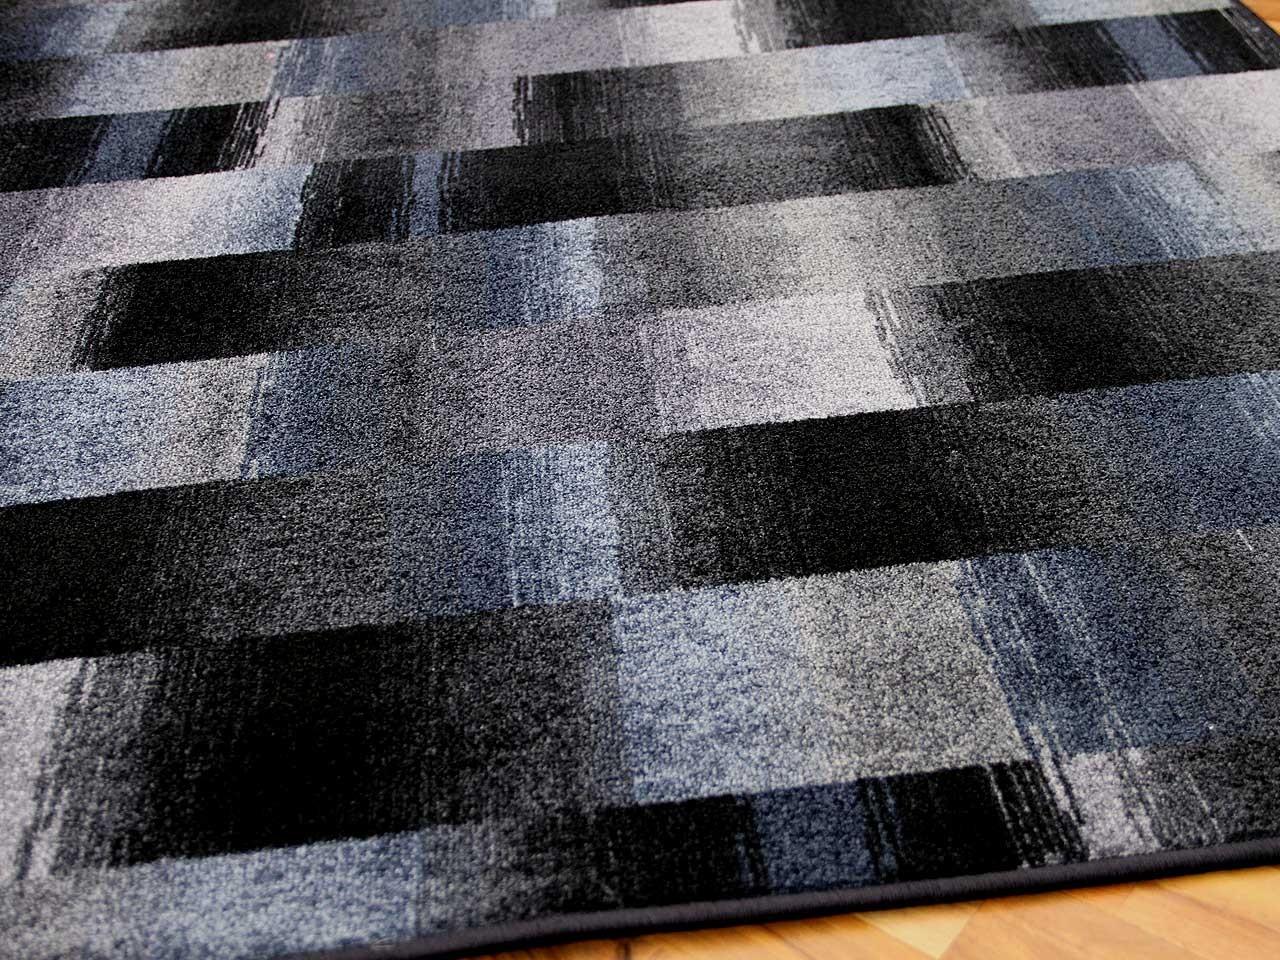 designer velour teppich mystic karo blau grau teppiche designerteppiche mystic teppiche. Black Bedroom Furniture Sets. Home Design Ideas